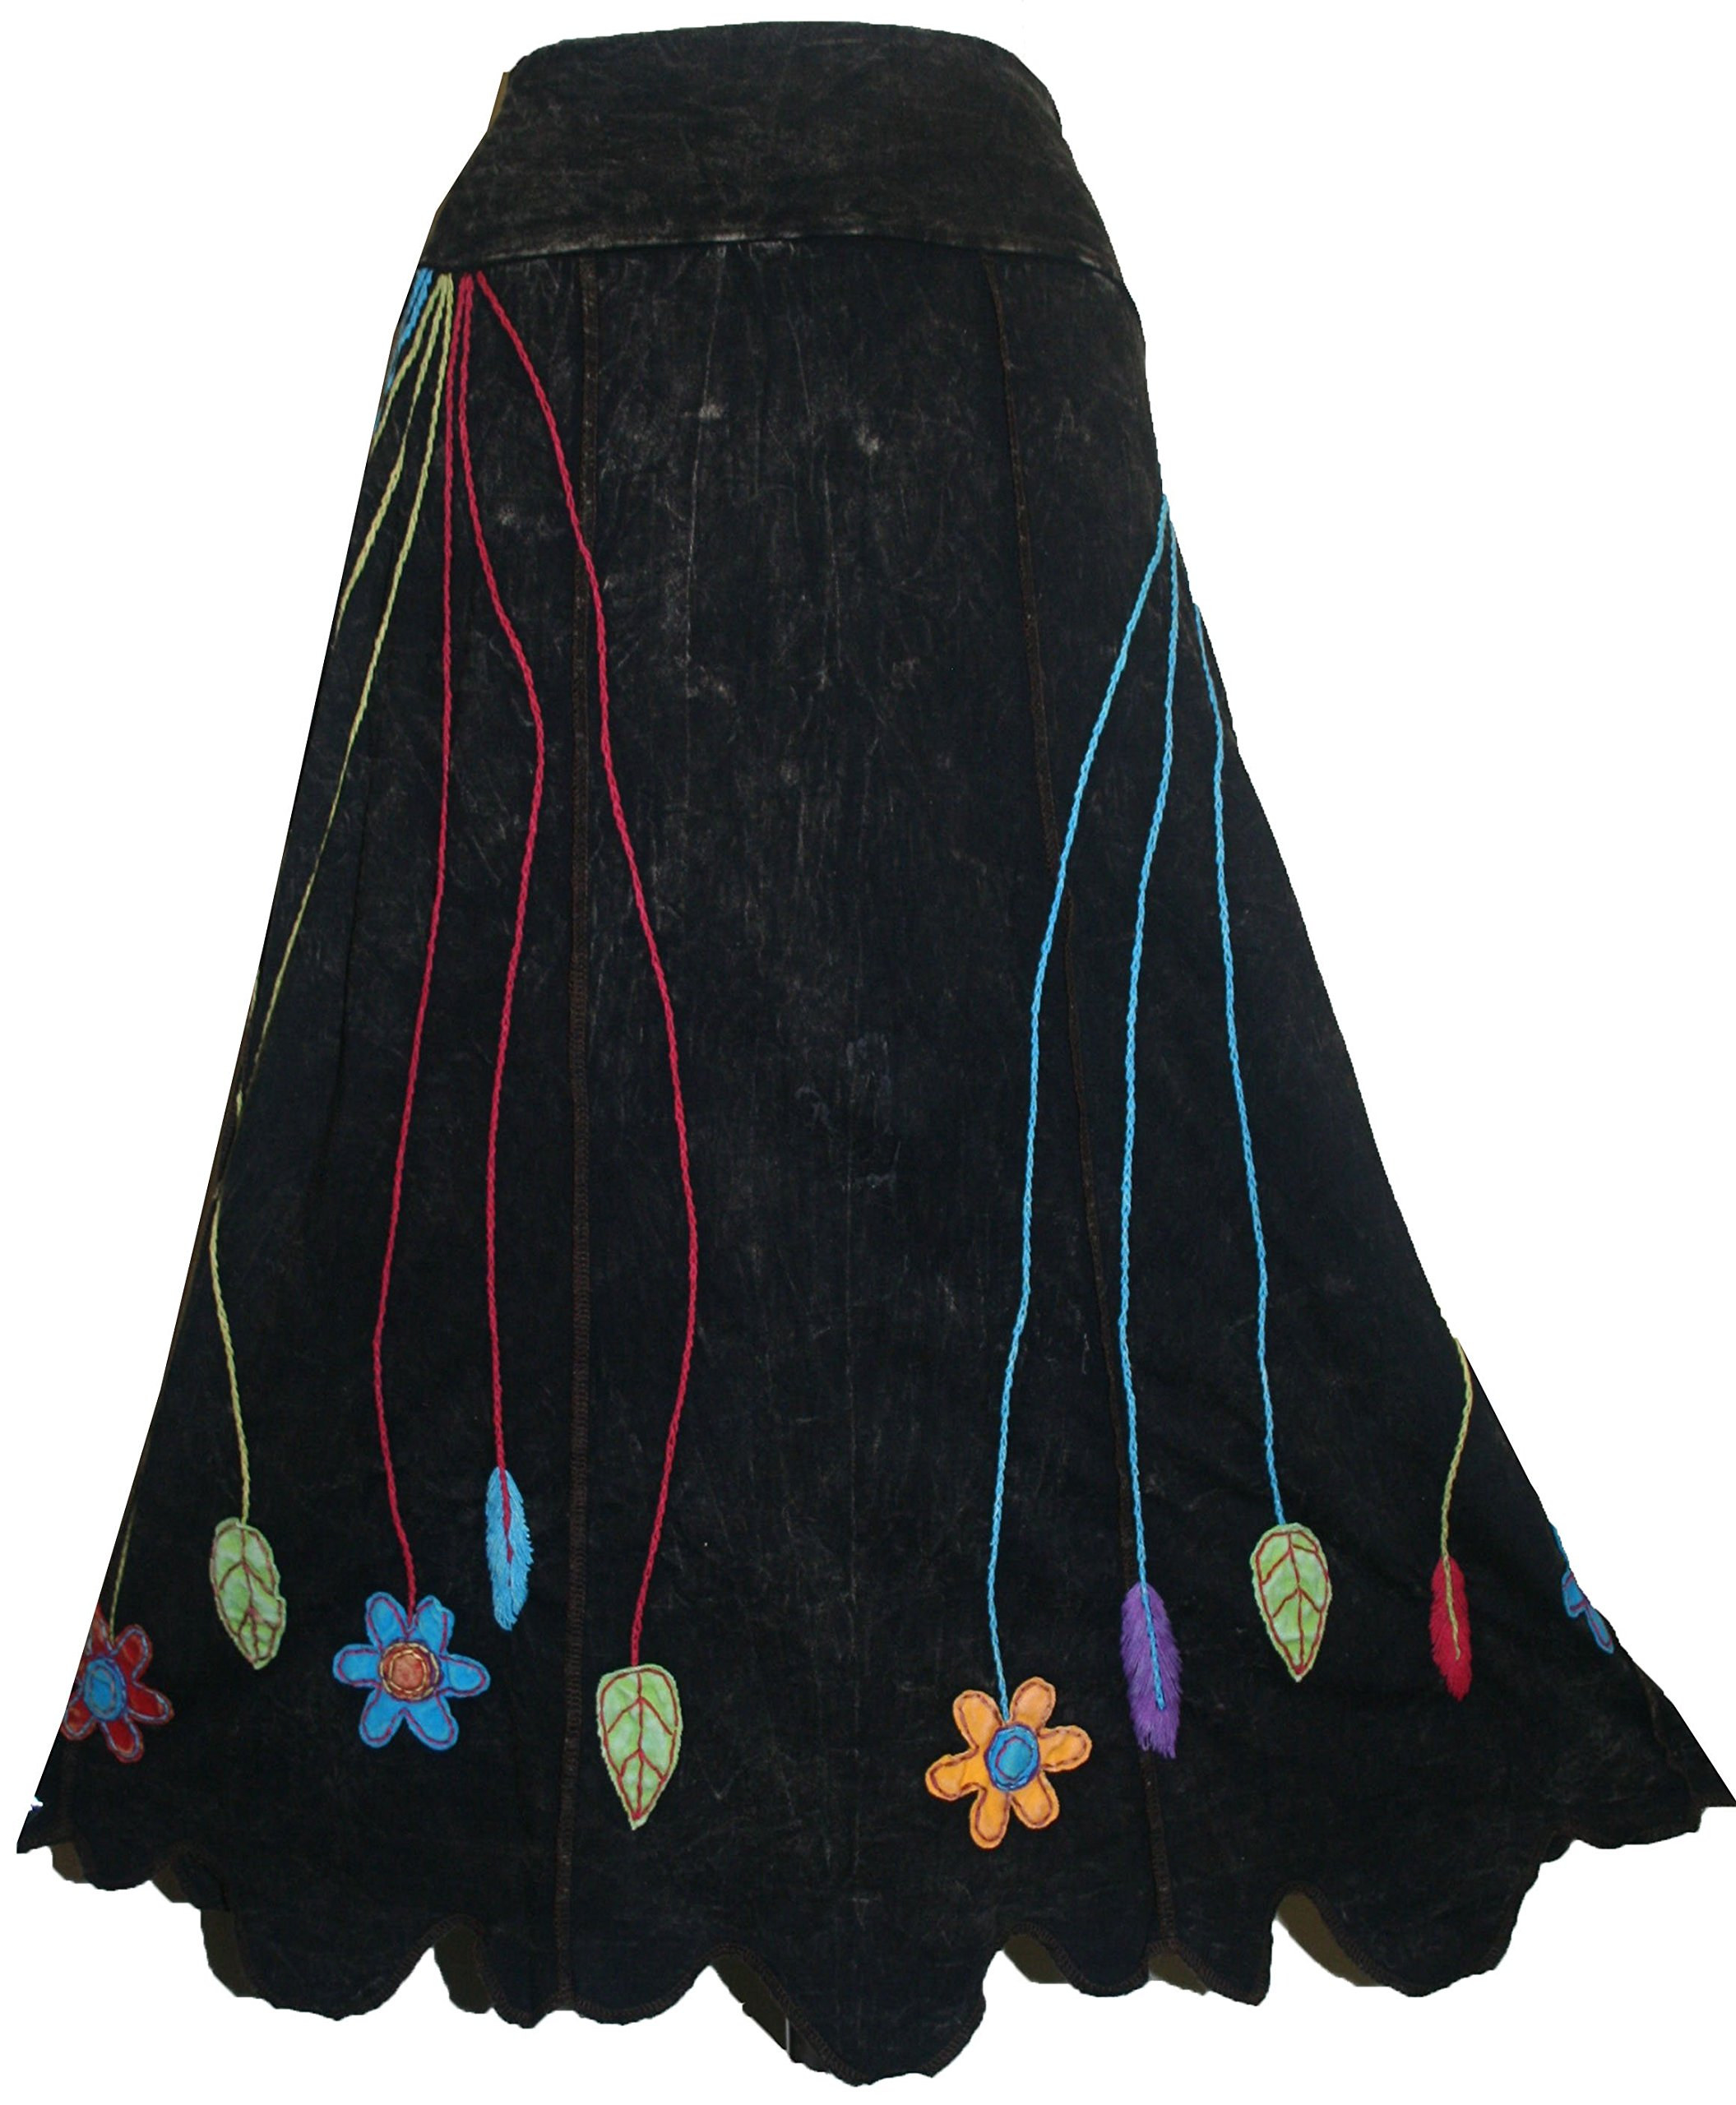 402 RS Agan Traders Rib Flower Embroidery Skirt [Black; XXL]